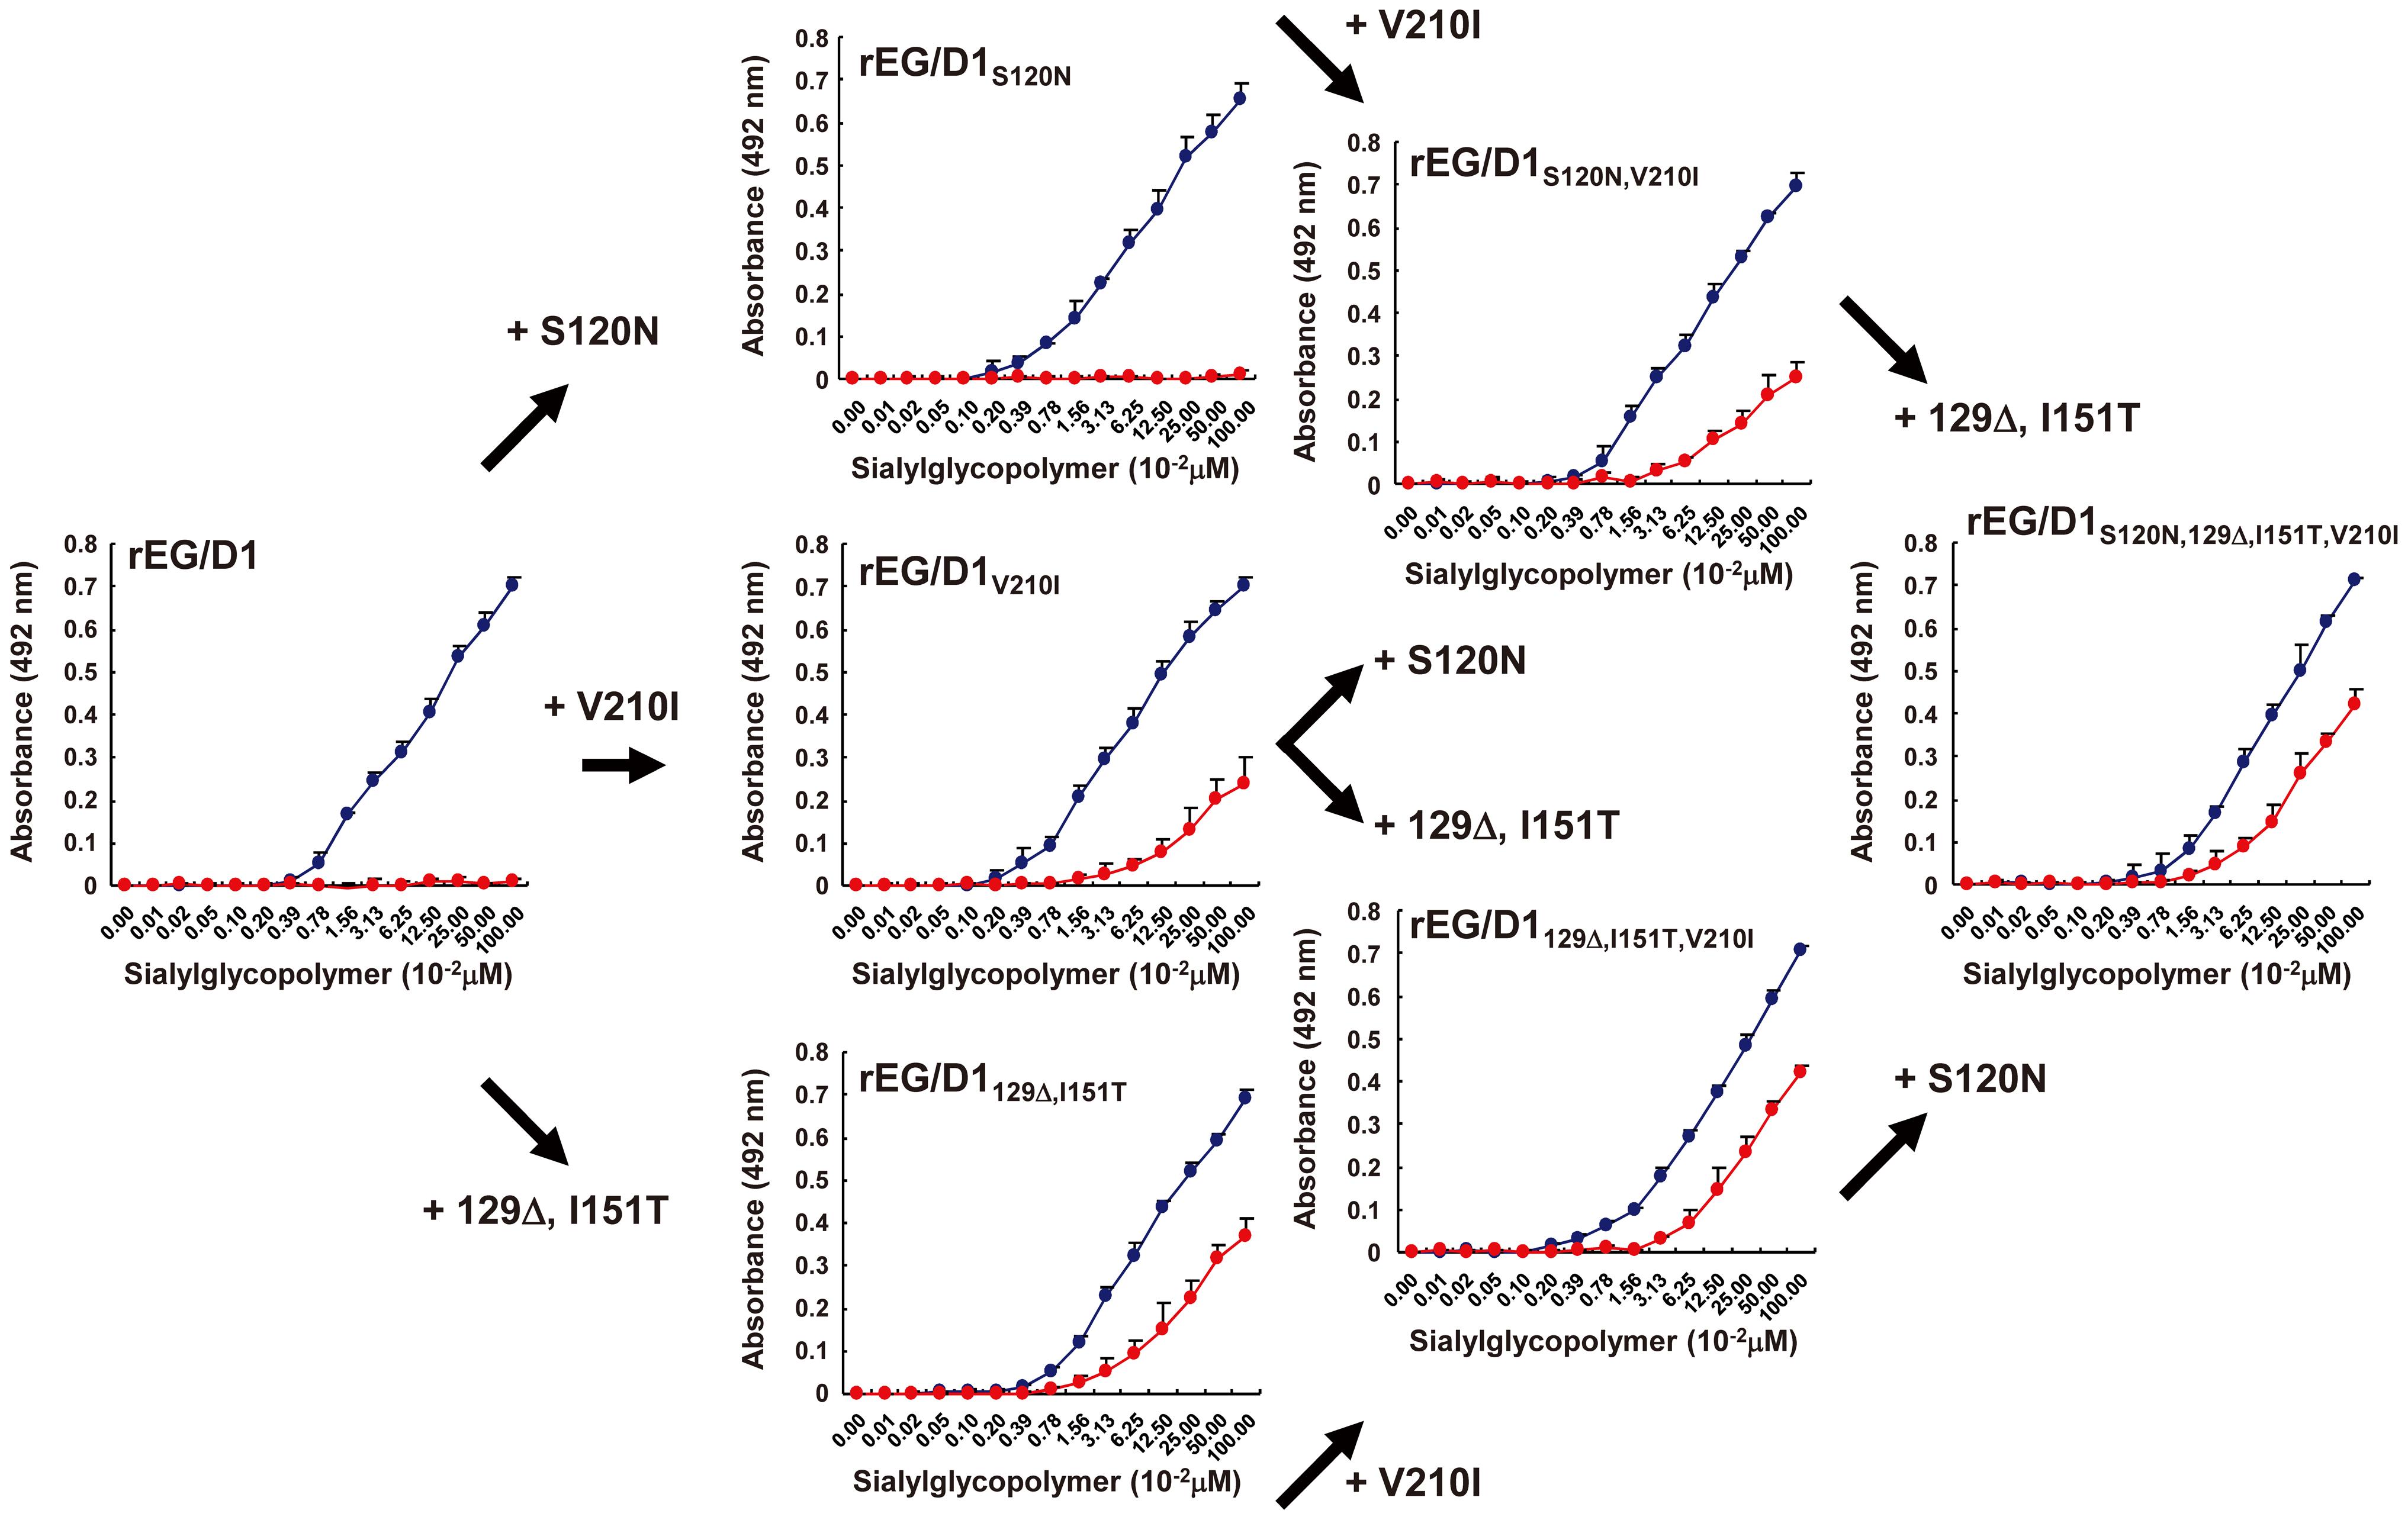 Effect of HA mutations in sublineage BII viruses on receptor specificity of EG/D1 HA.